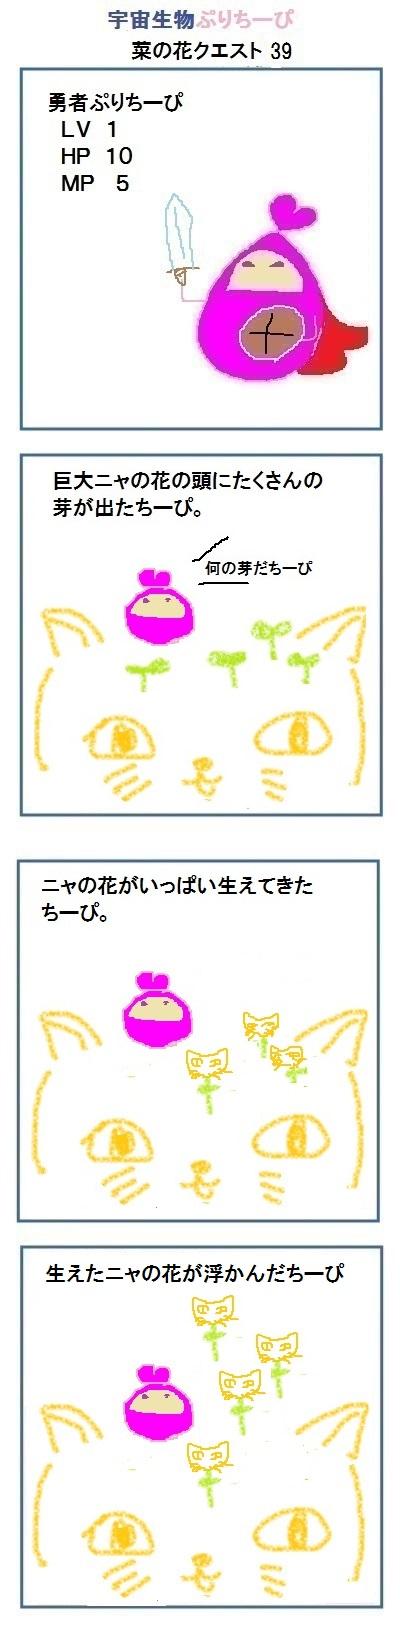 160422_nanohana_quest39.jpg